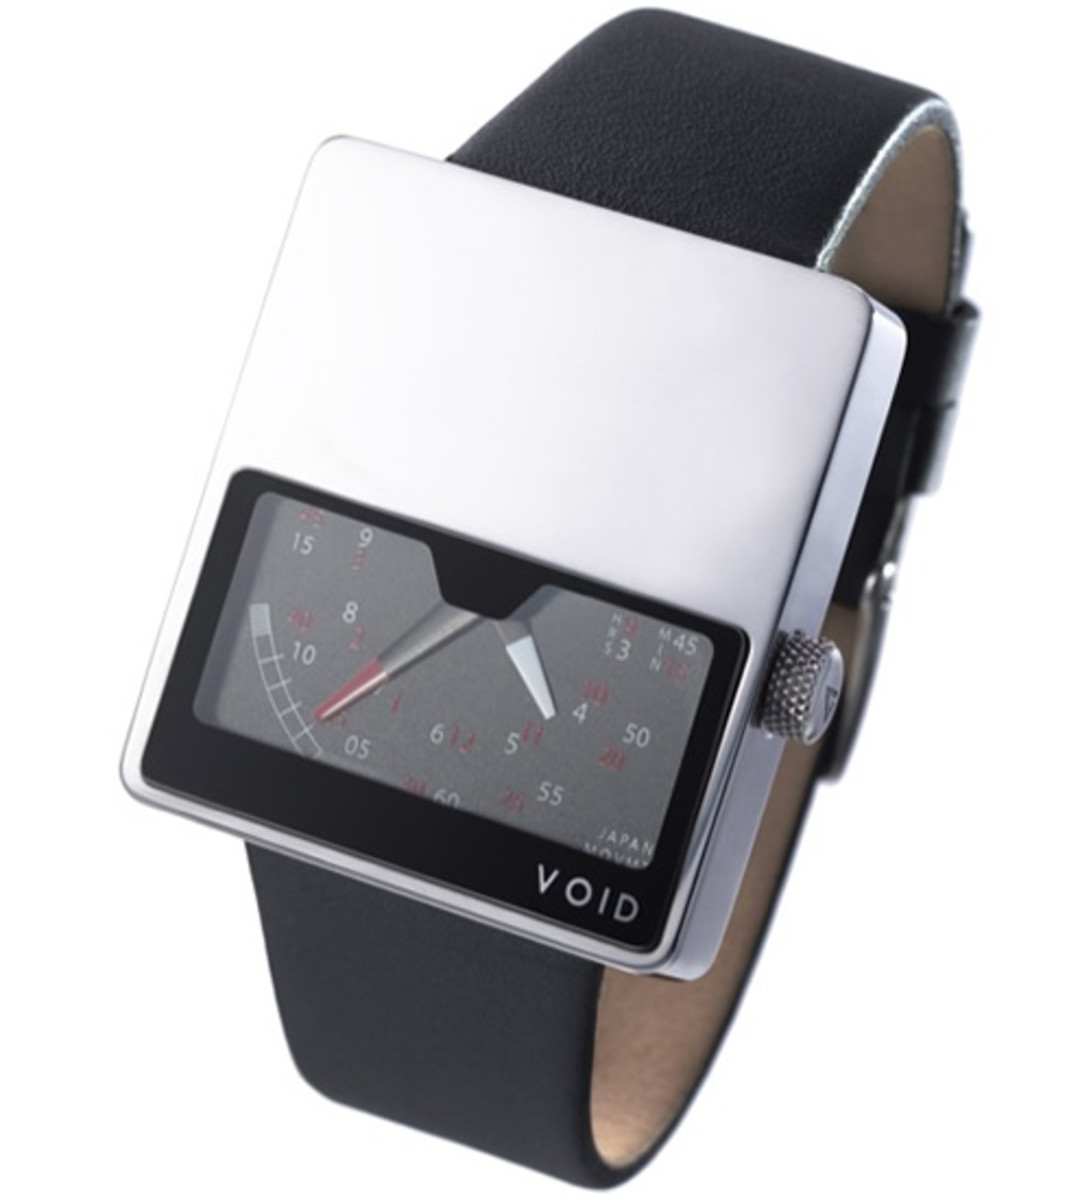 voidv02